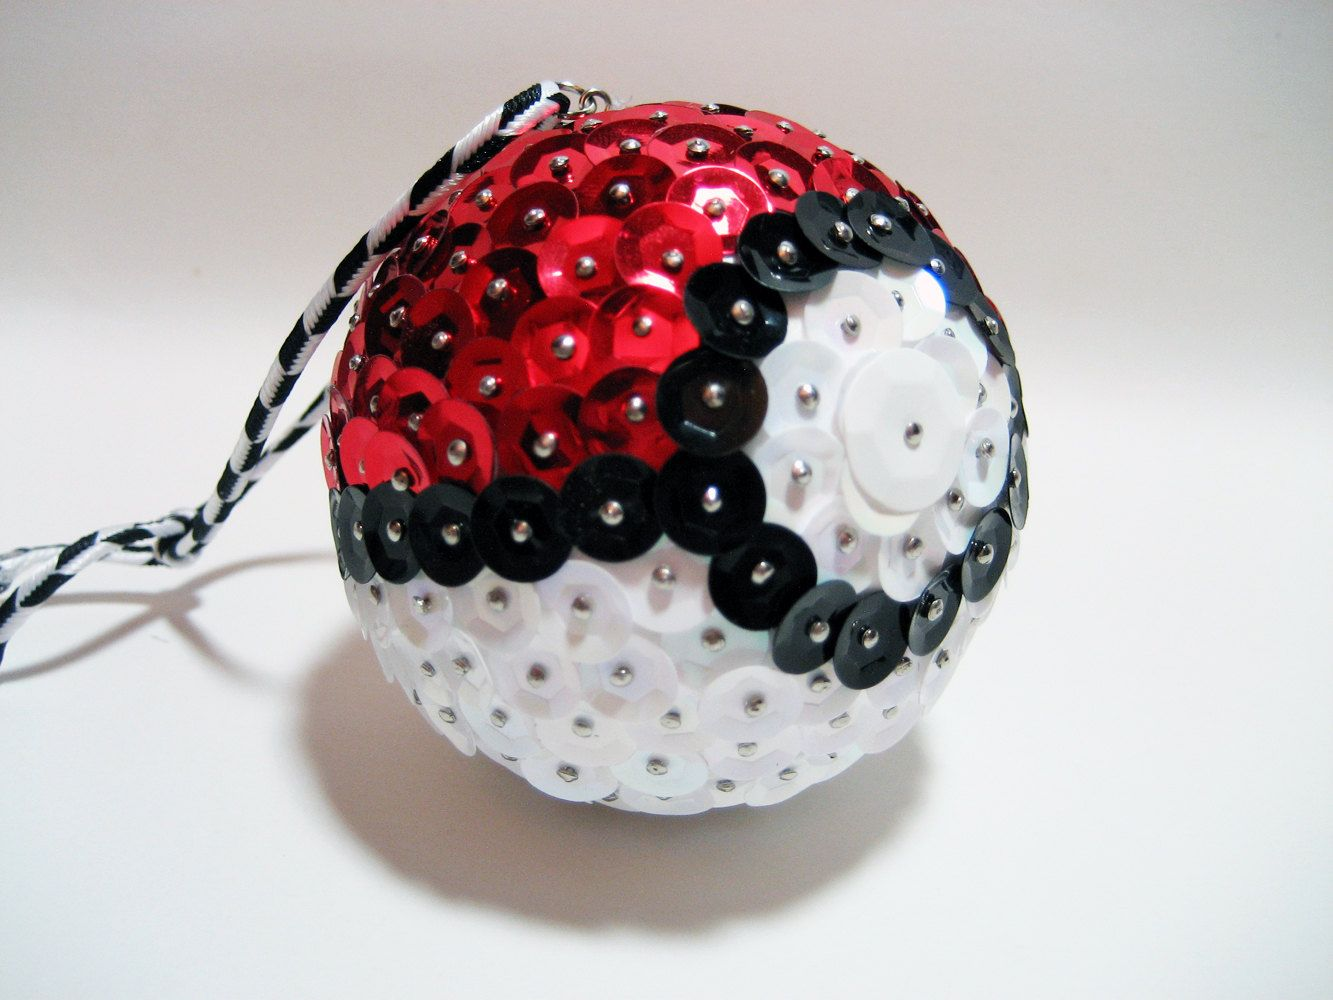 pokemon pokeball ornament red white and black sequin nintendo handmade christmas ornament geek chic geekery video game holidays 1300 via etsy